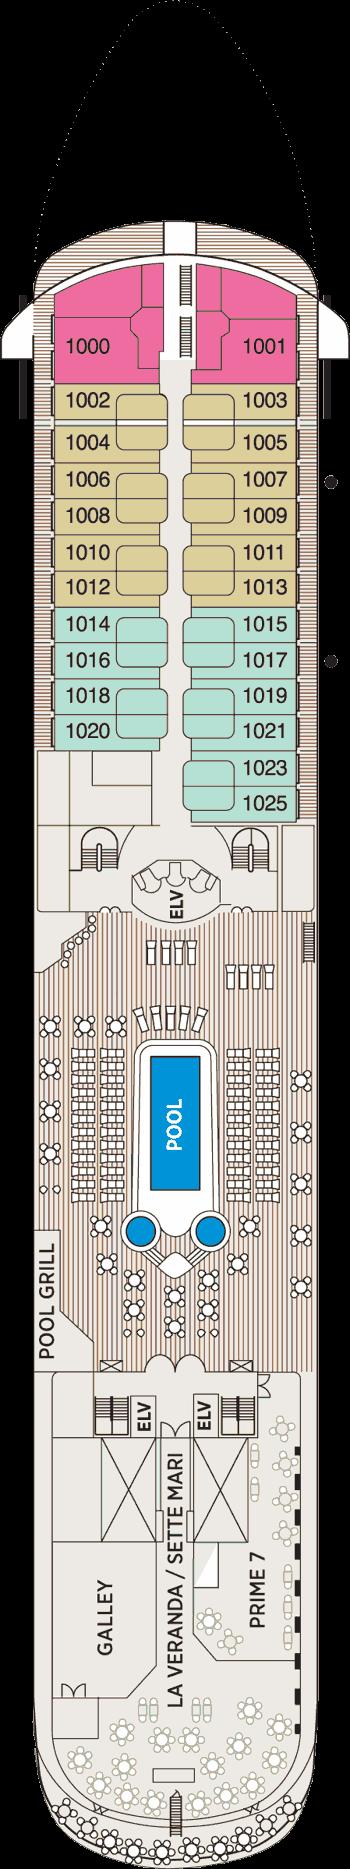 Seven Seas Navigator - Deck 10